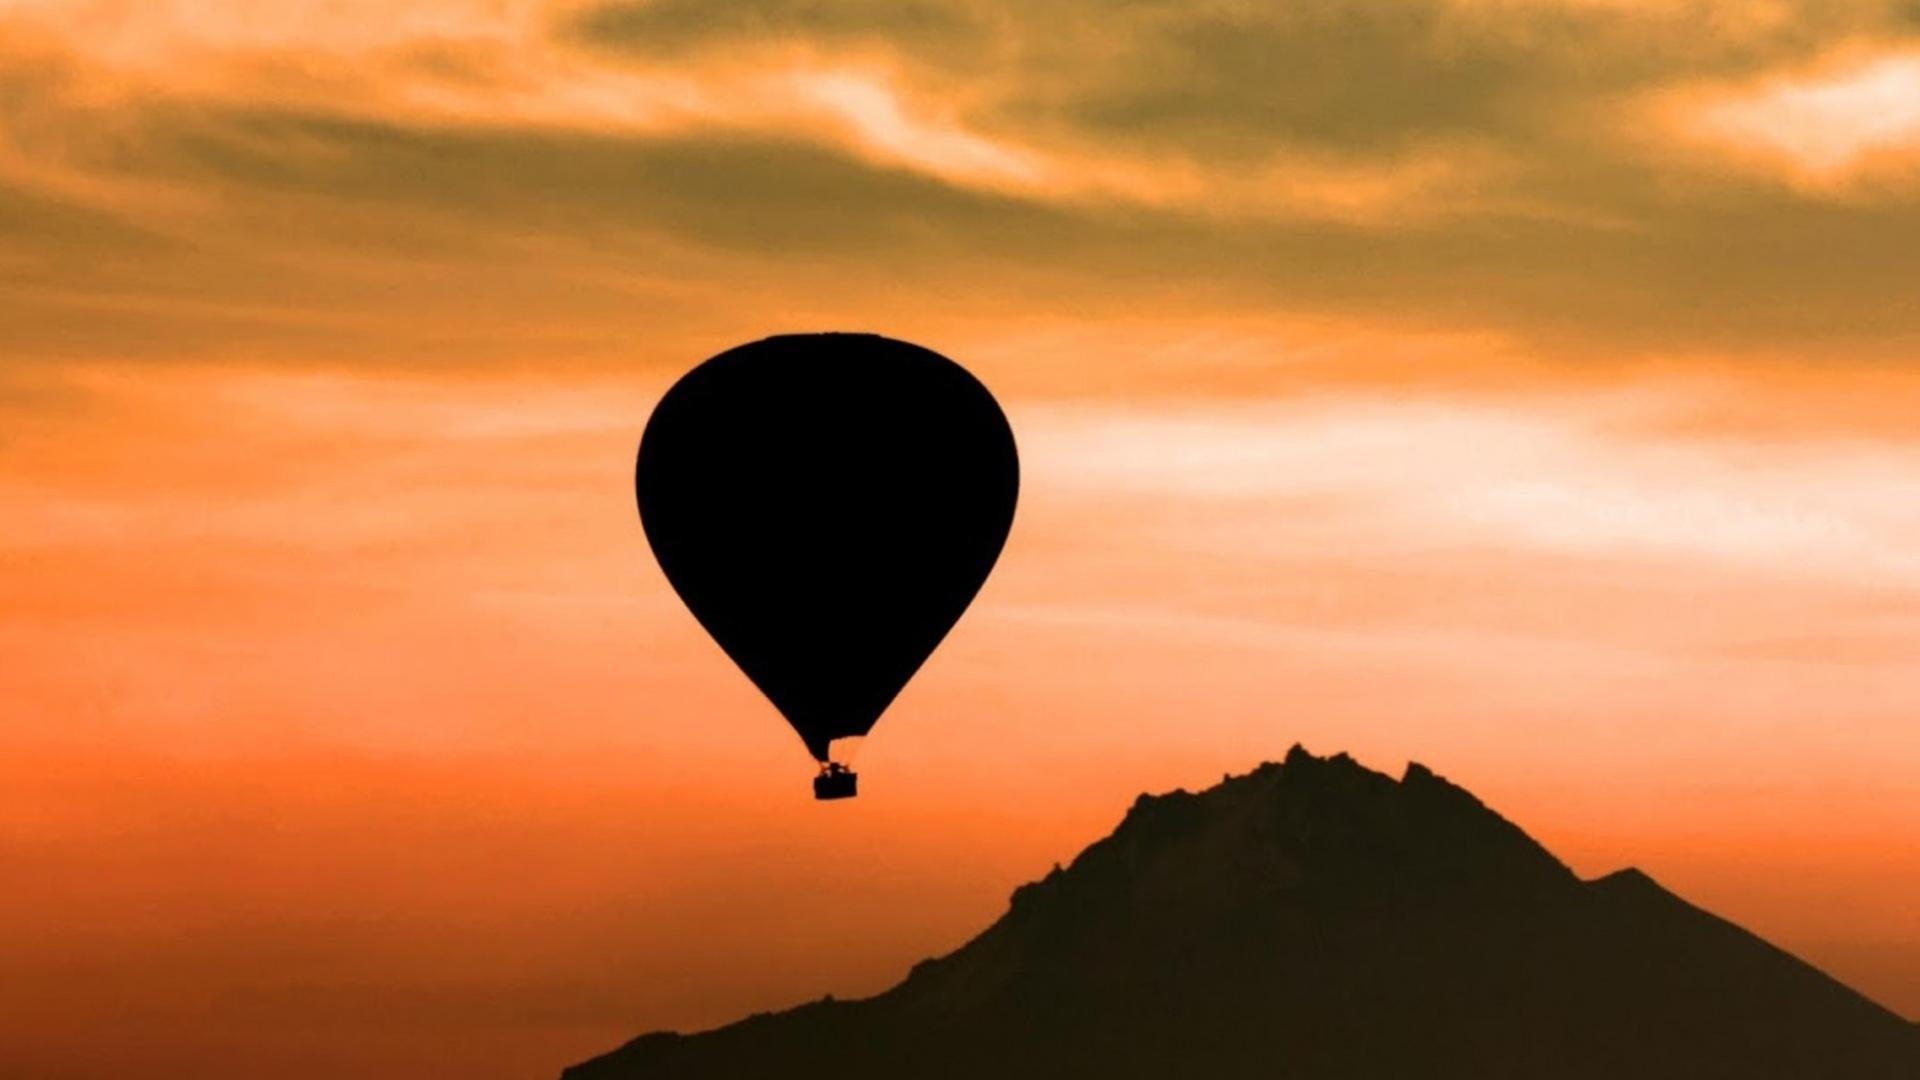 Mountain Sunset Balloons Wallpaper